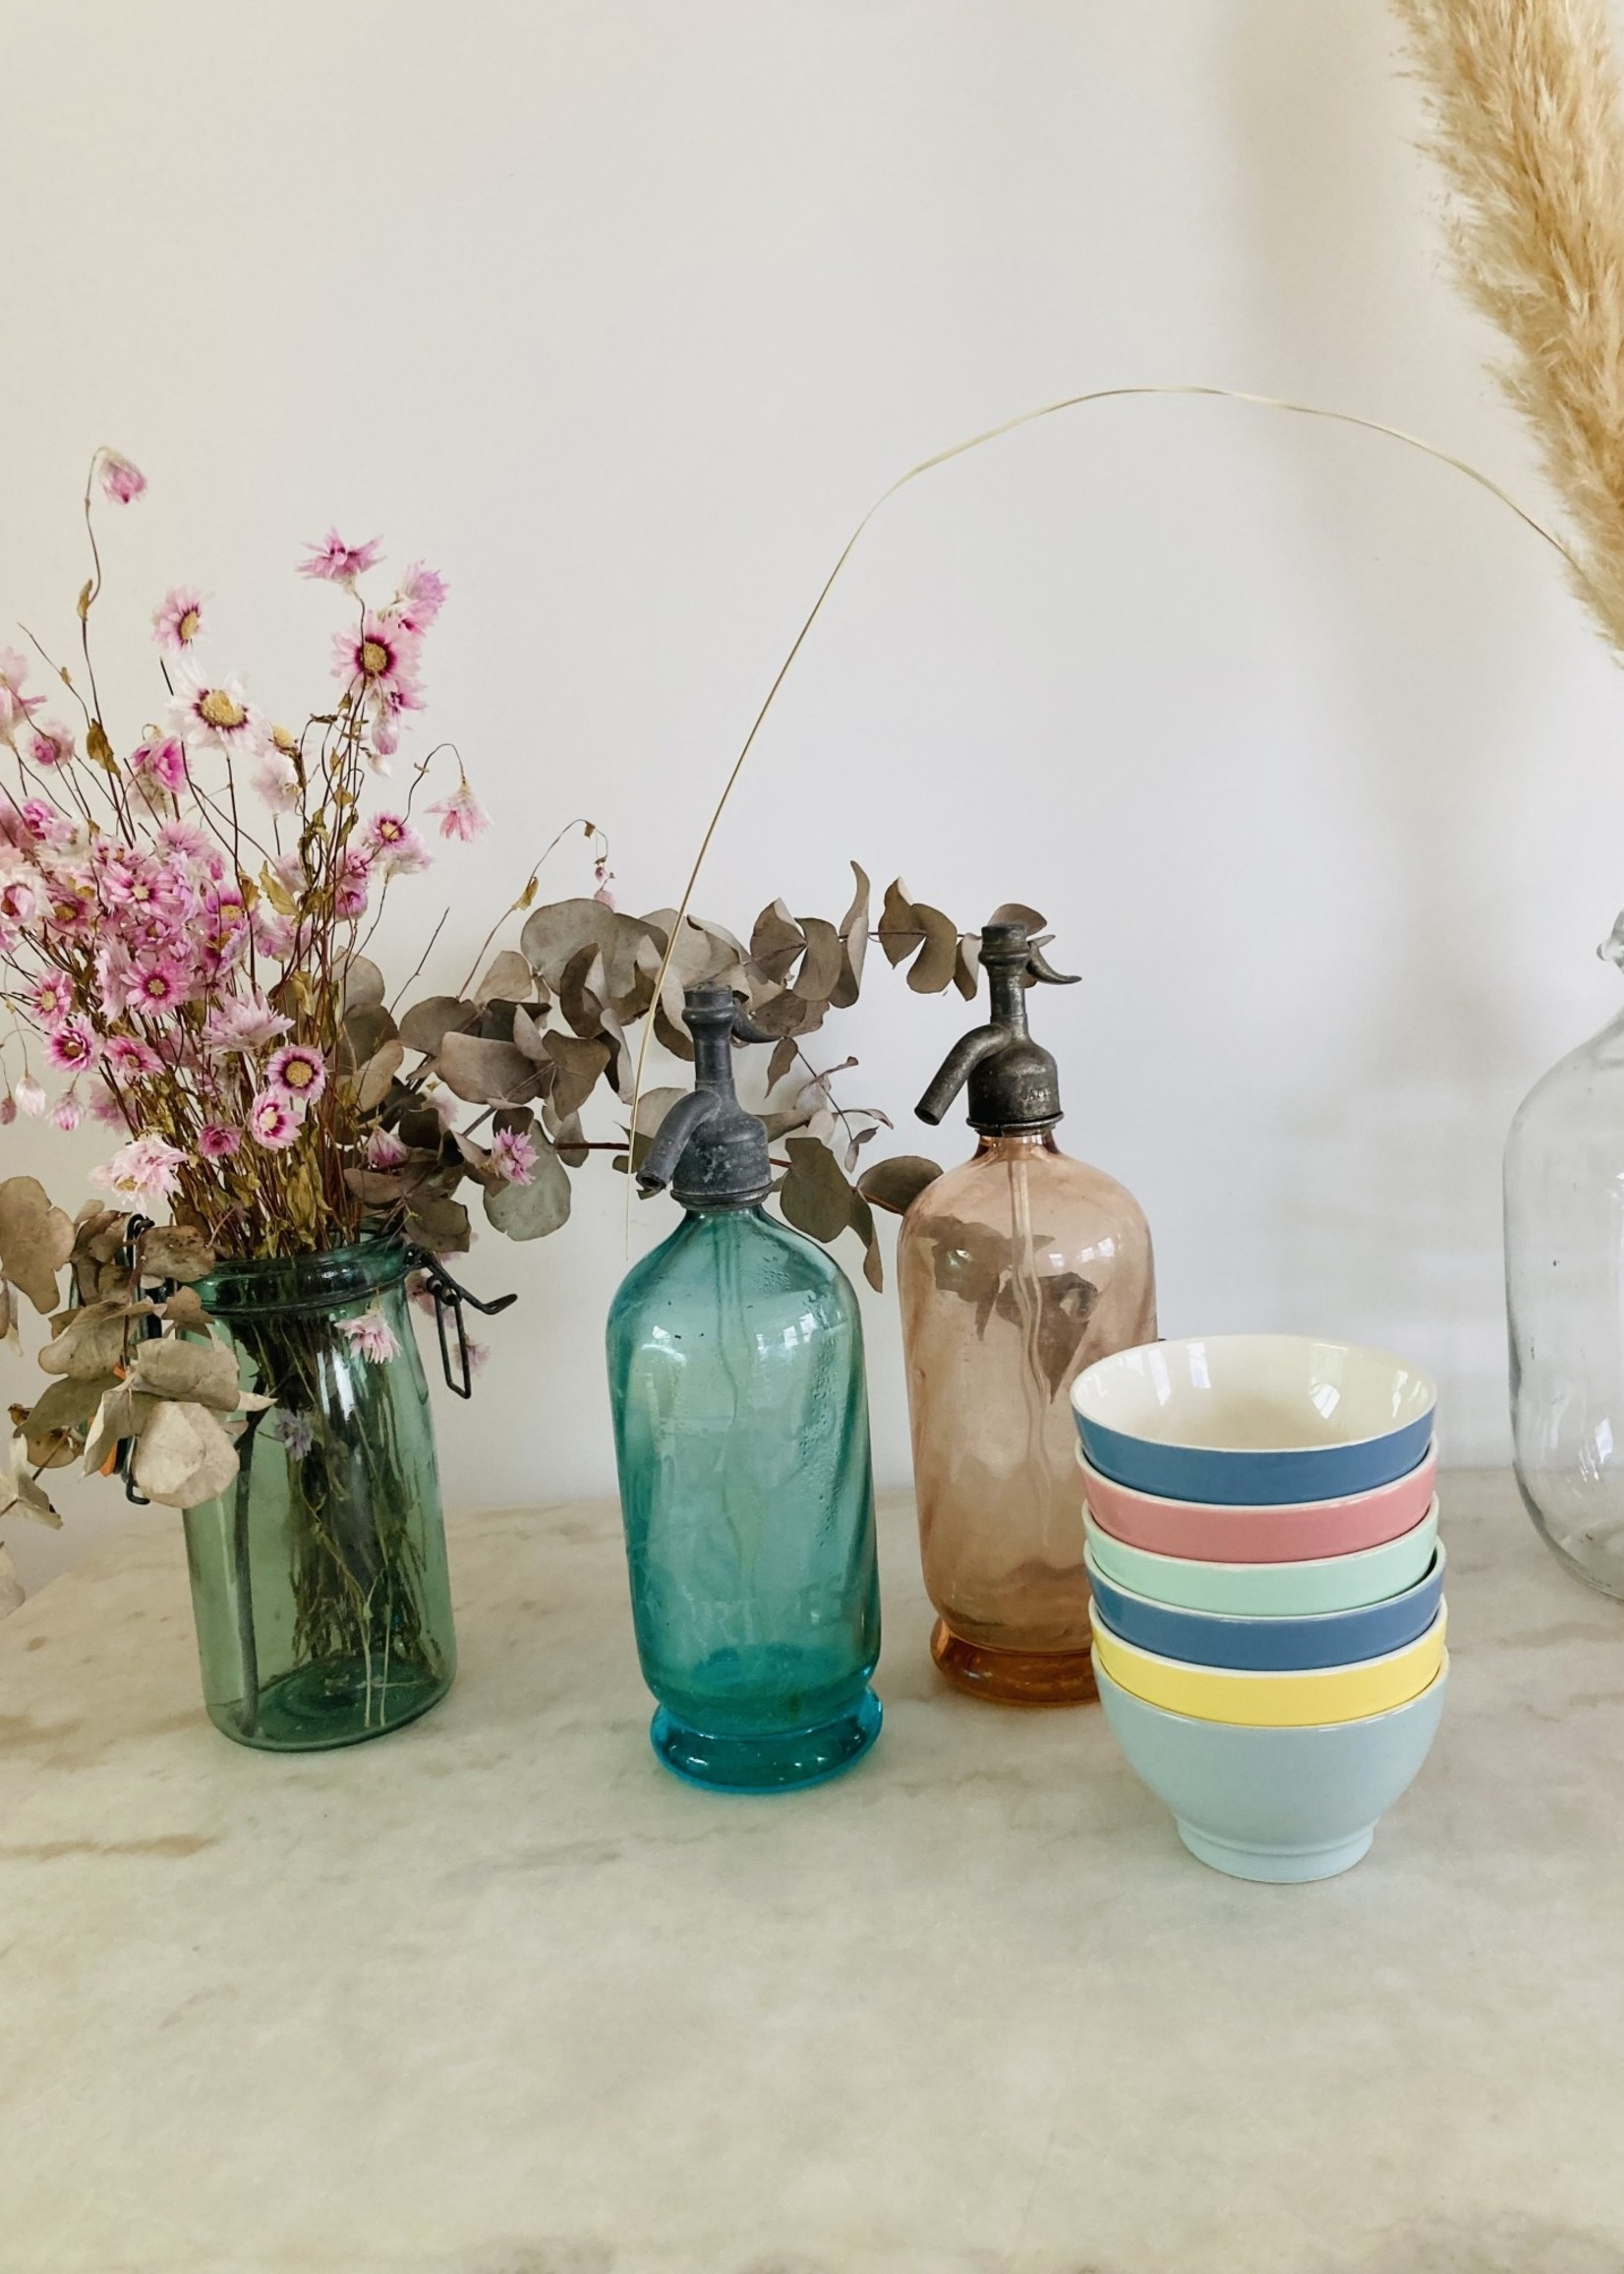 Antique Siphon for lemonade in blue green  glass